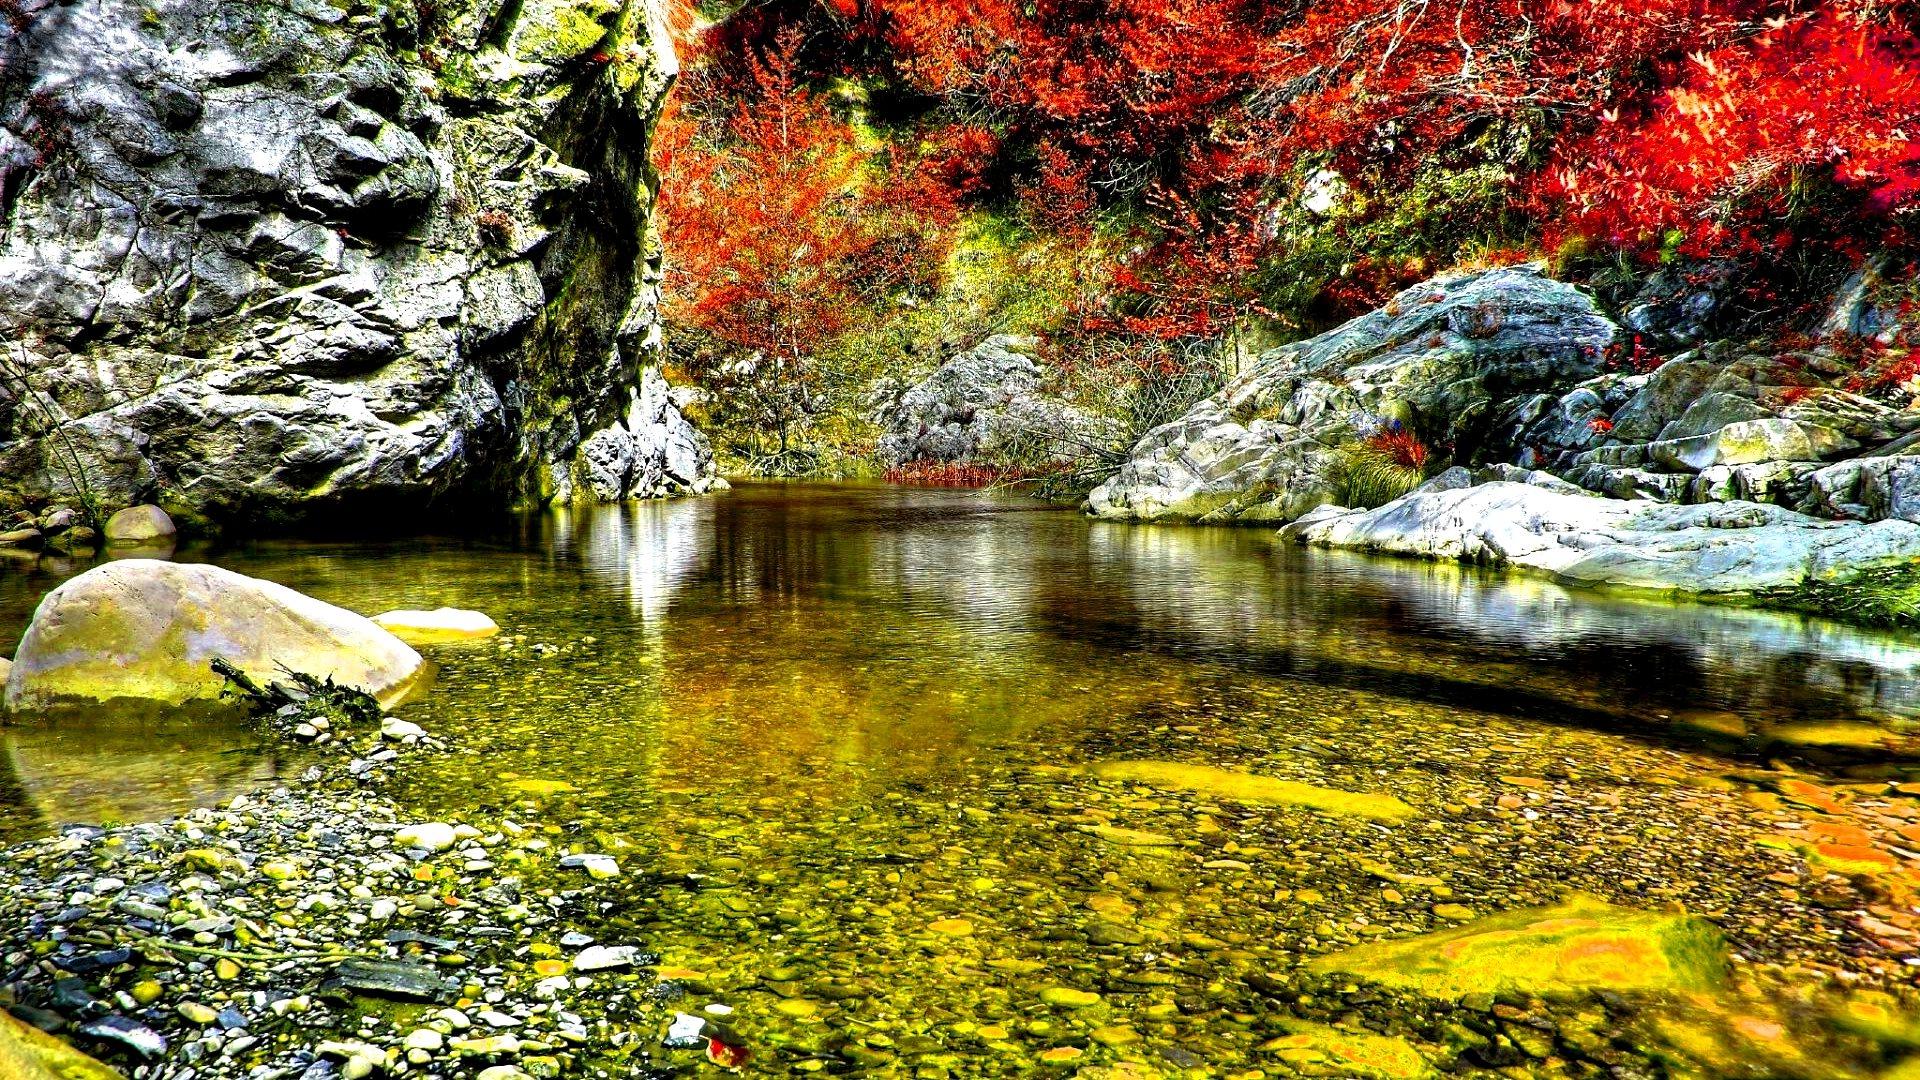 Pubg Iphone X Wallpaper Pond In Autumn 1920 X 1080